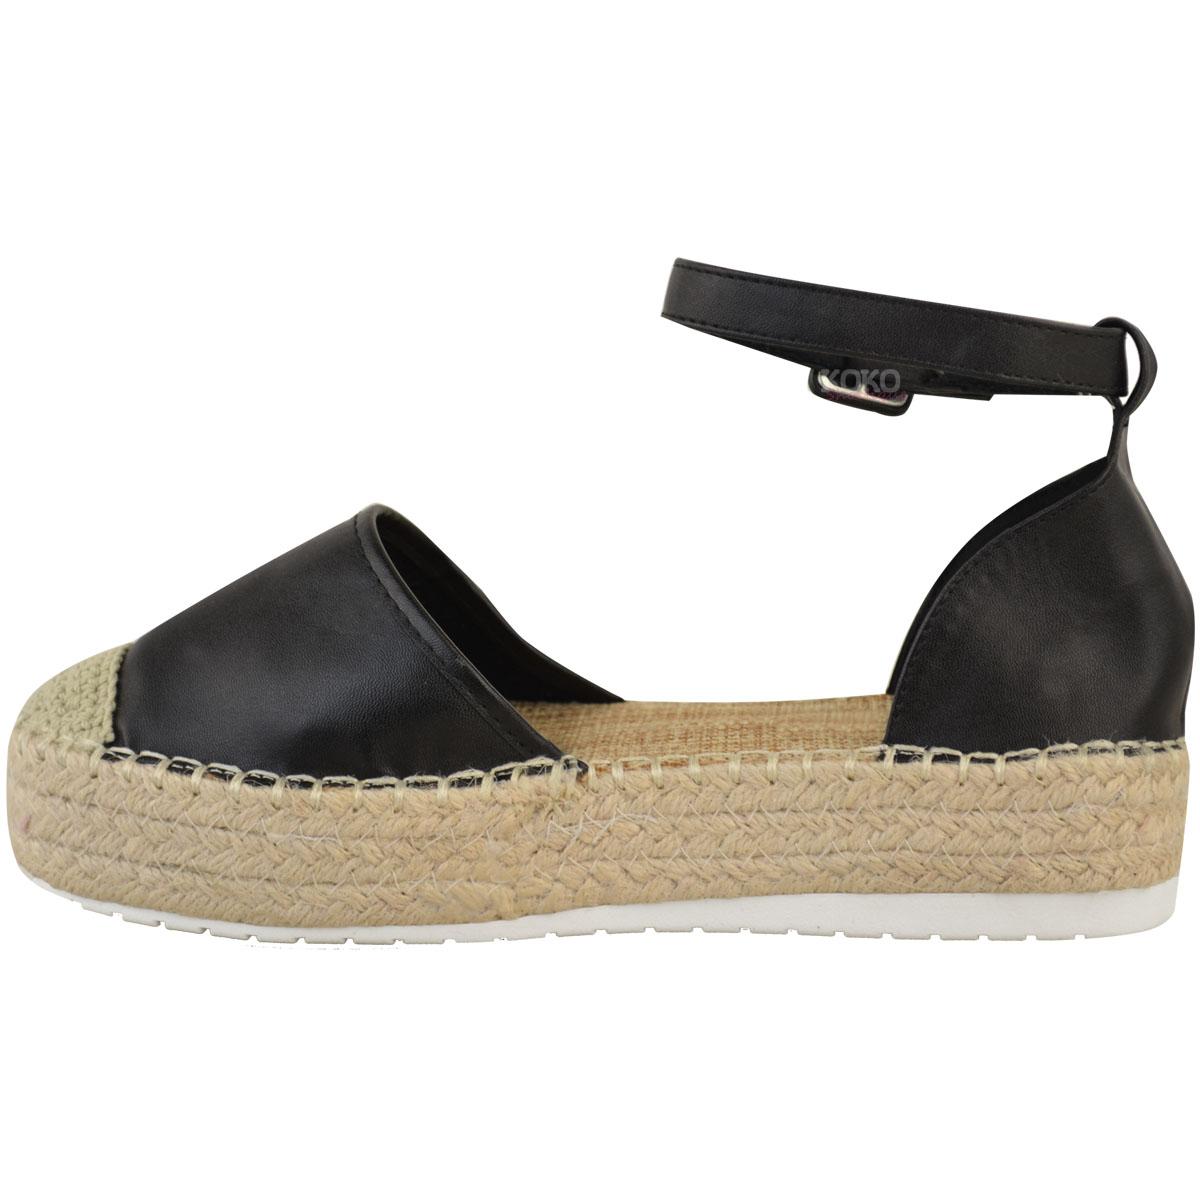 womens espadrilles wedge platform sandals summer